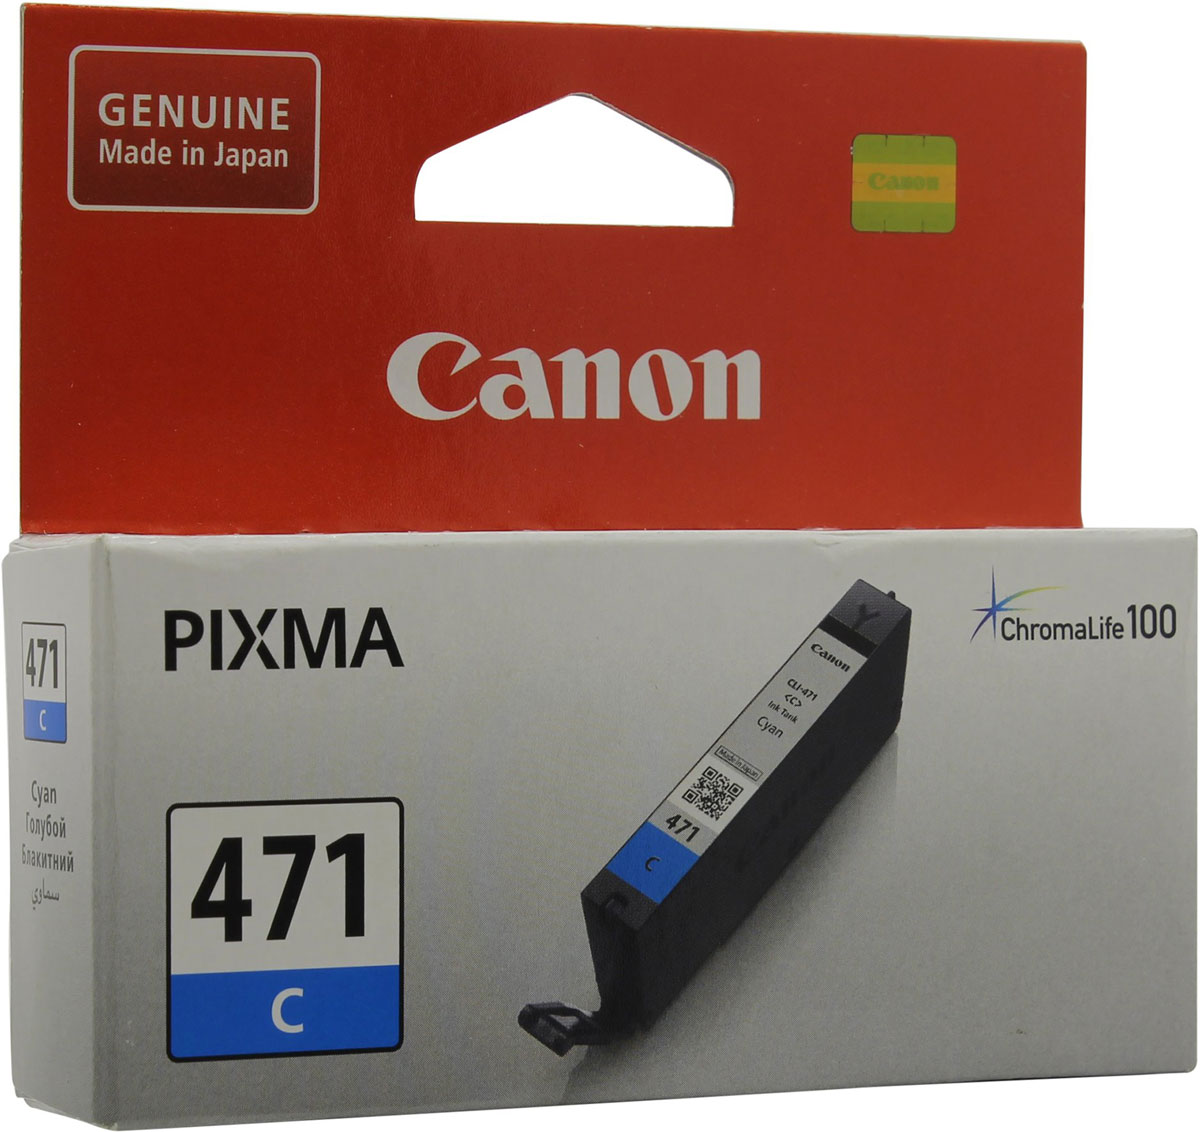 Фото - Canon CLI-471, Cyan картридж для PIXMA MG5740/MG6840/MG7740 meike fc 100 for nikon canon fc 100 macro ring flash light nikon d7100 d7000 d5200 d5100 d5000 d3200 d310